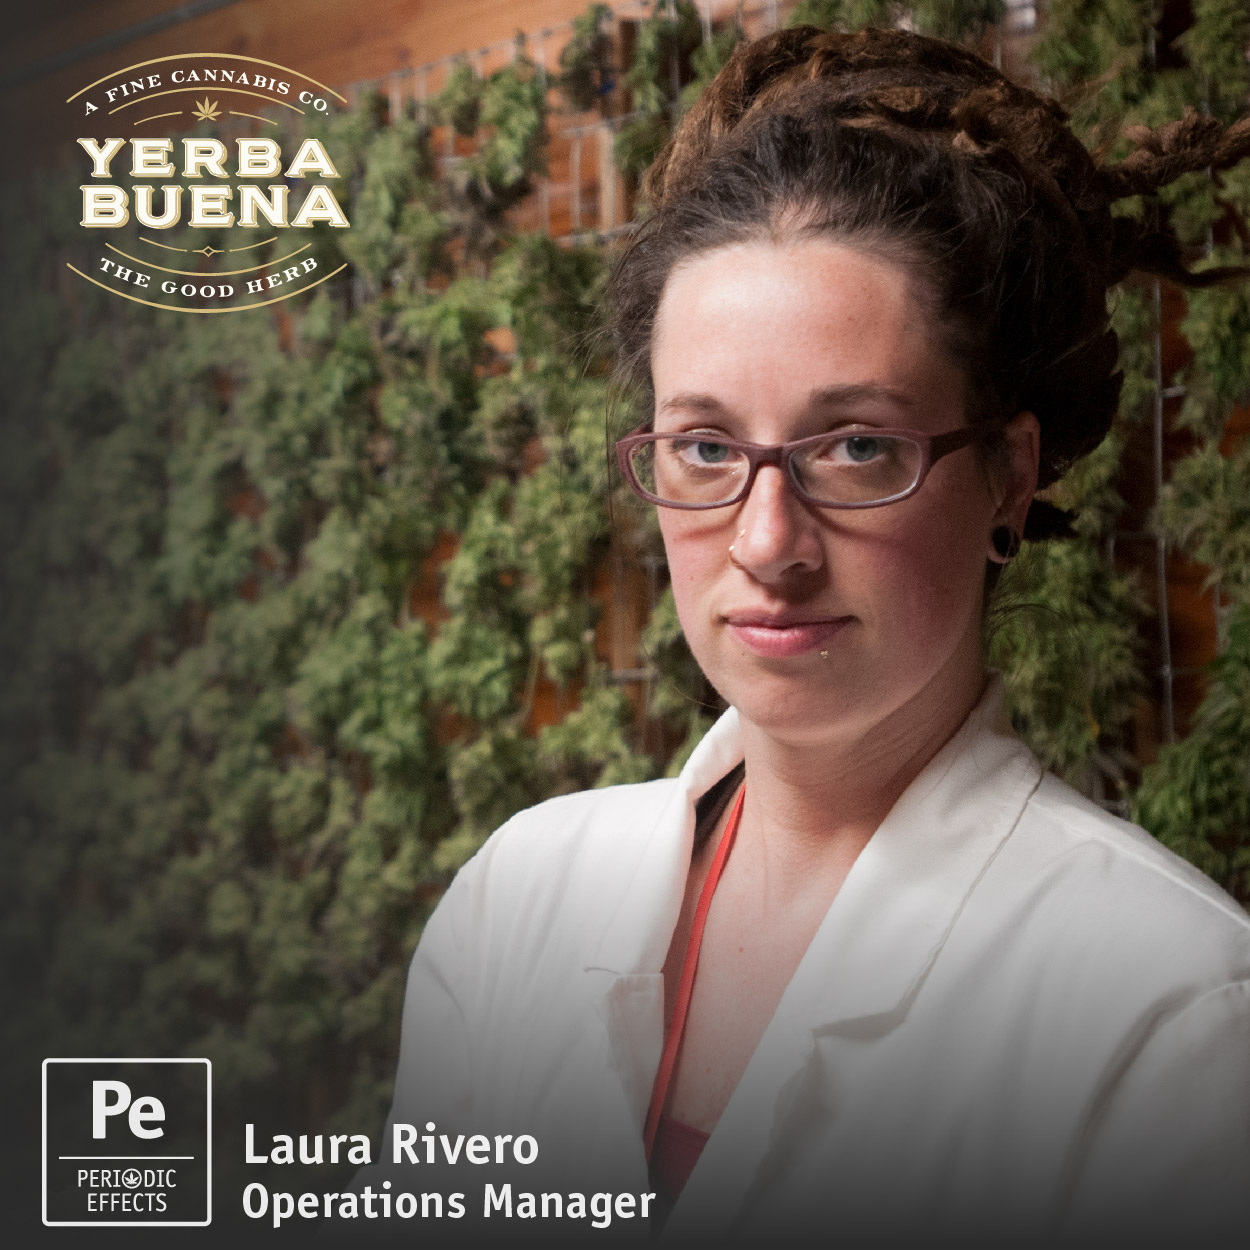 Laura Rivero, Operations Manager at Yerba Buena, an Oregon Cannabis Producer